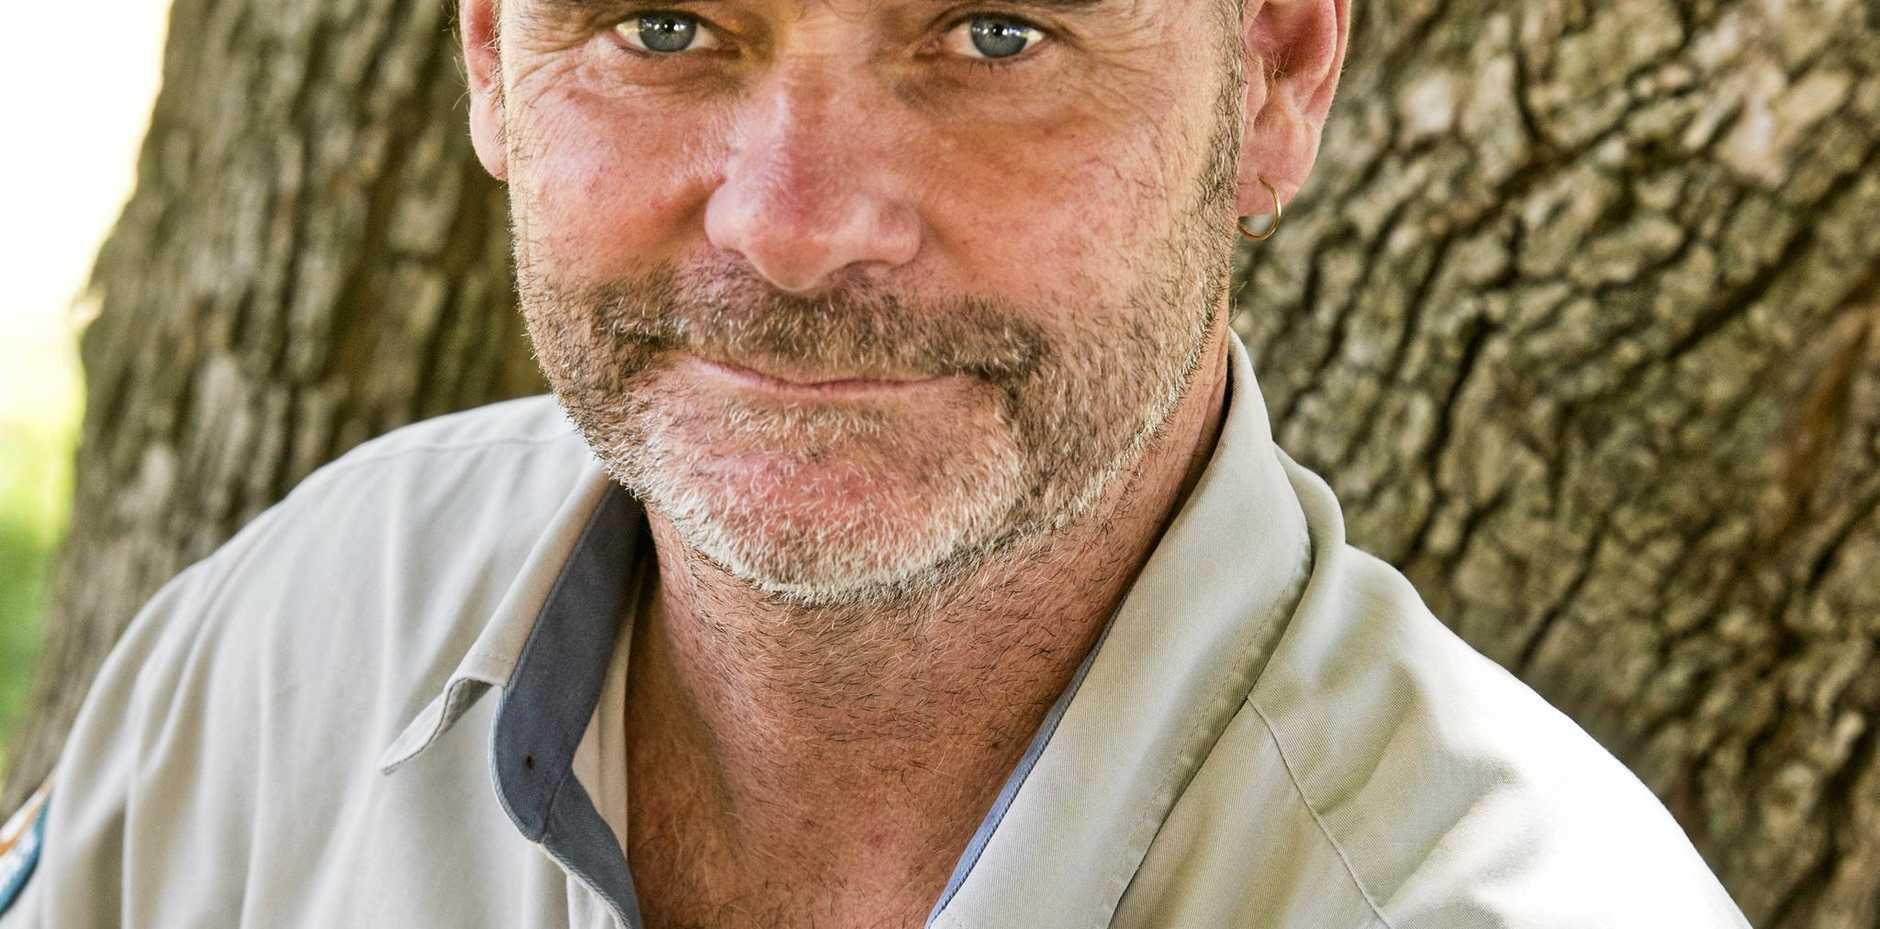 SPECIAL TRIP: Toowoomba ranger Stuart Johnson is heading back to Papua New Guinea to work on the Kokoda Track.